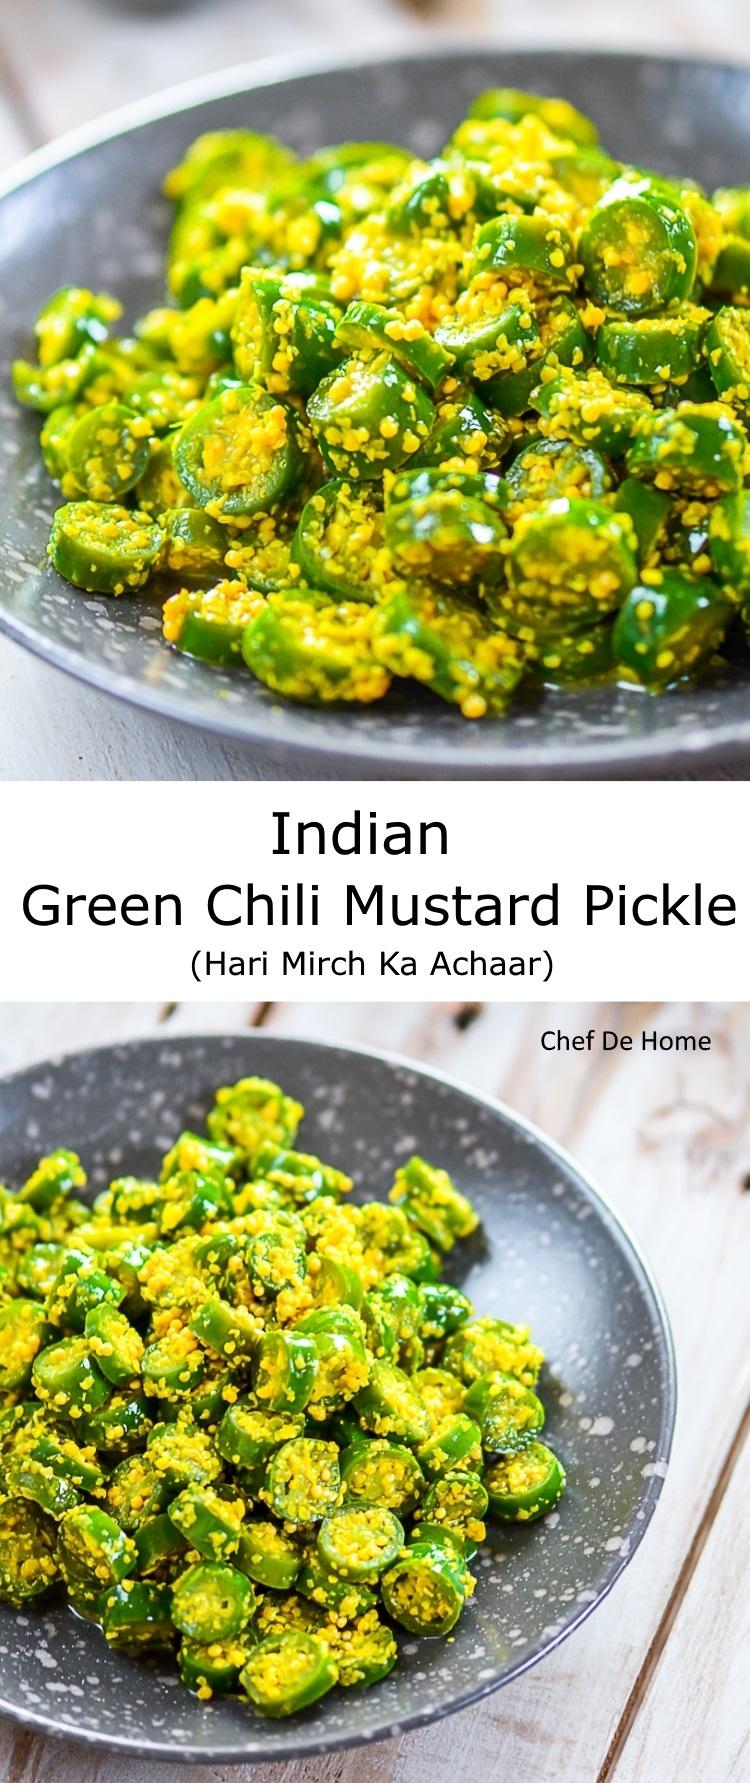 Indian Green Chili Pickle in mustard and lemons | Hari Mirch Ka Achaar | chefdehome.com